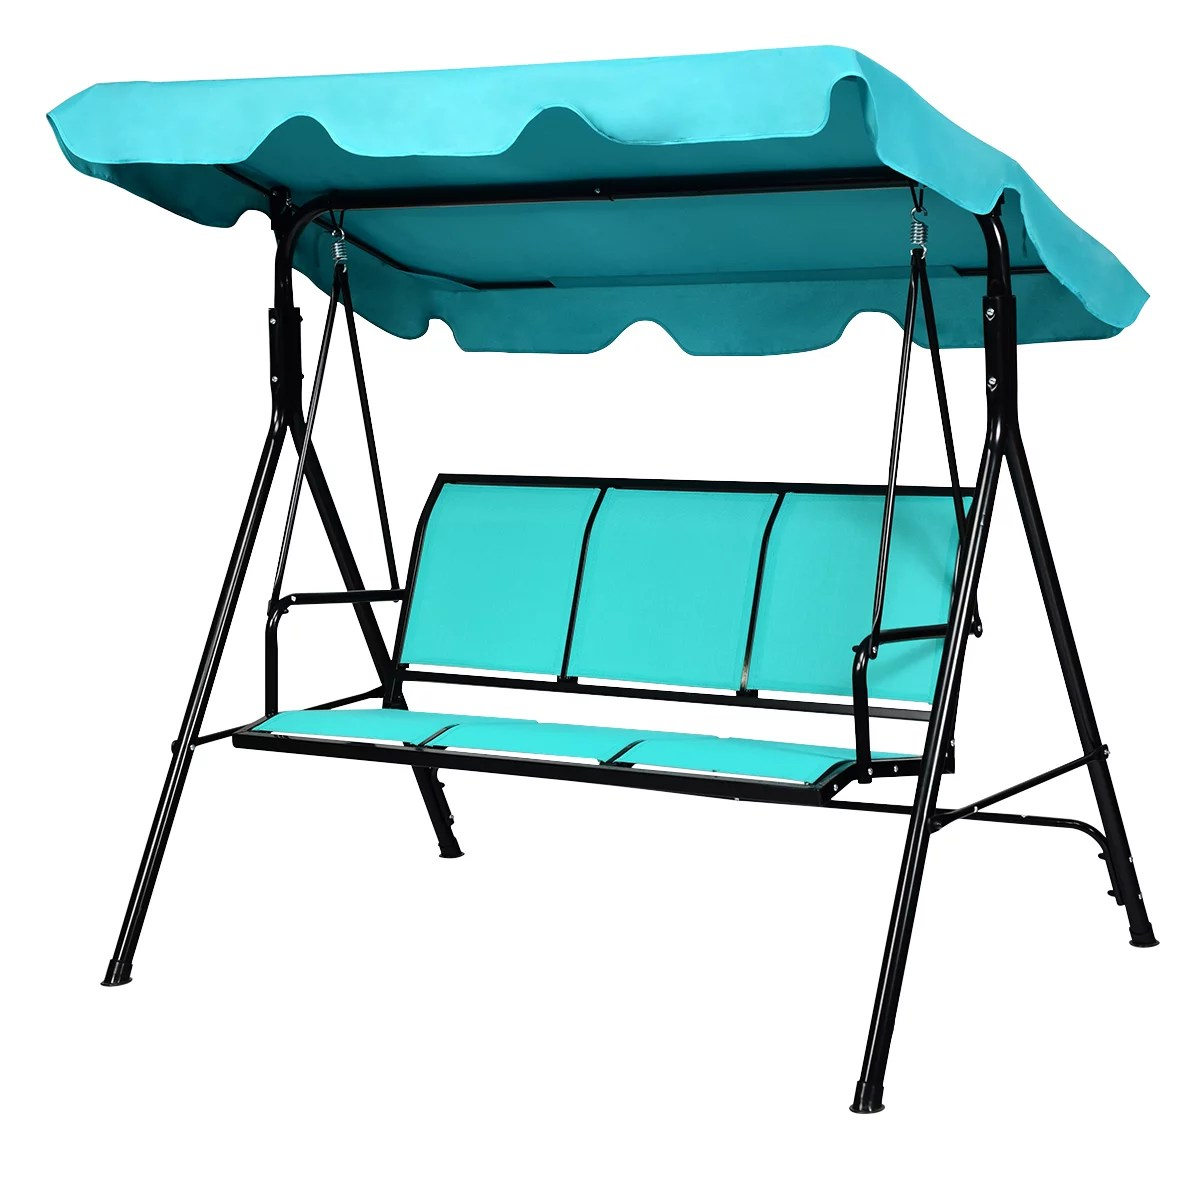 topbuy outdoor patio swing canopy bench chair rocking hammock blue